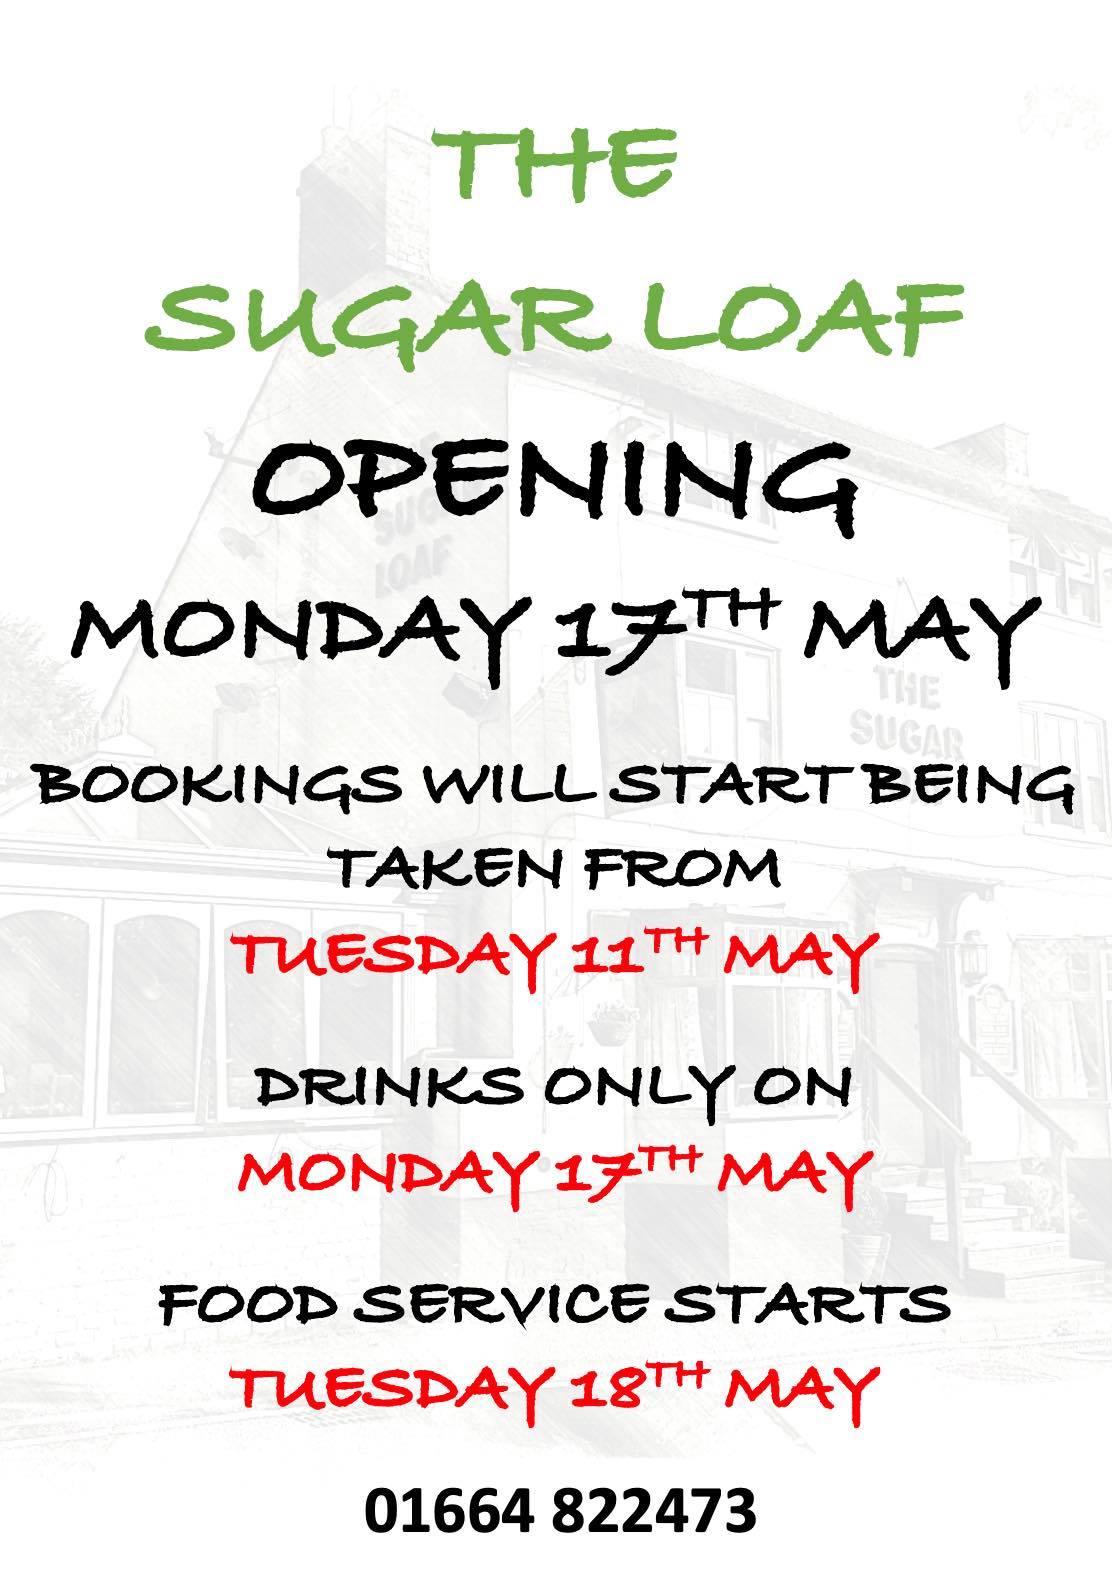 Sugar loaf opening